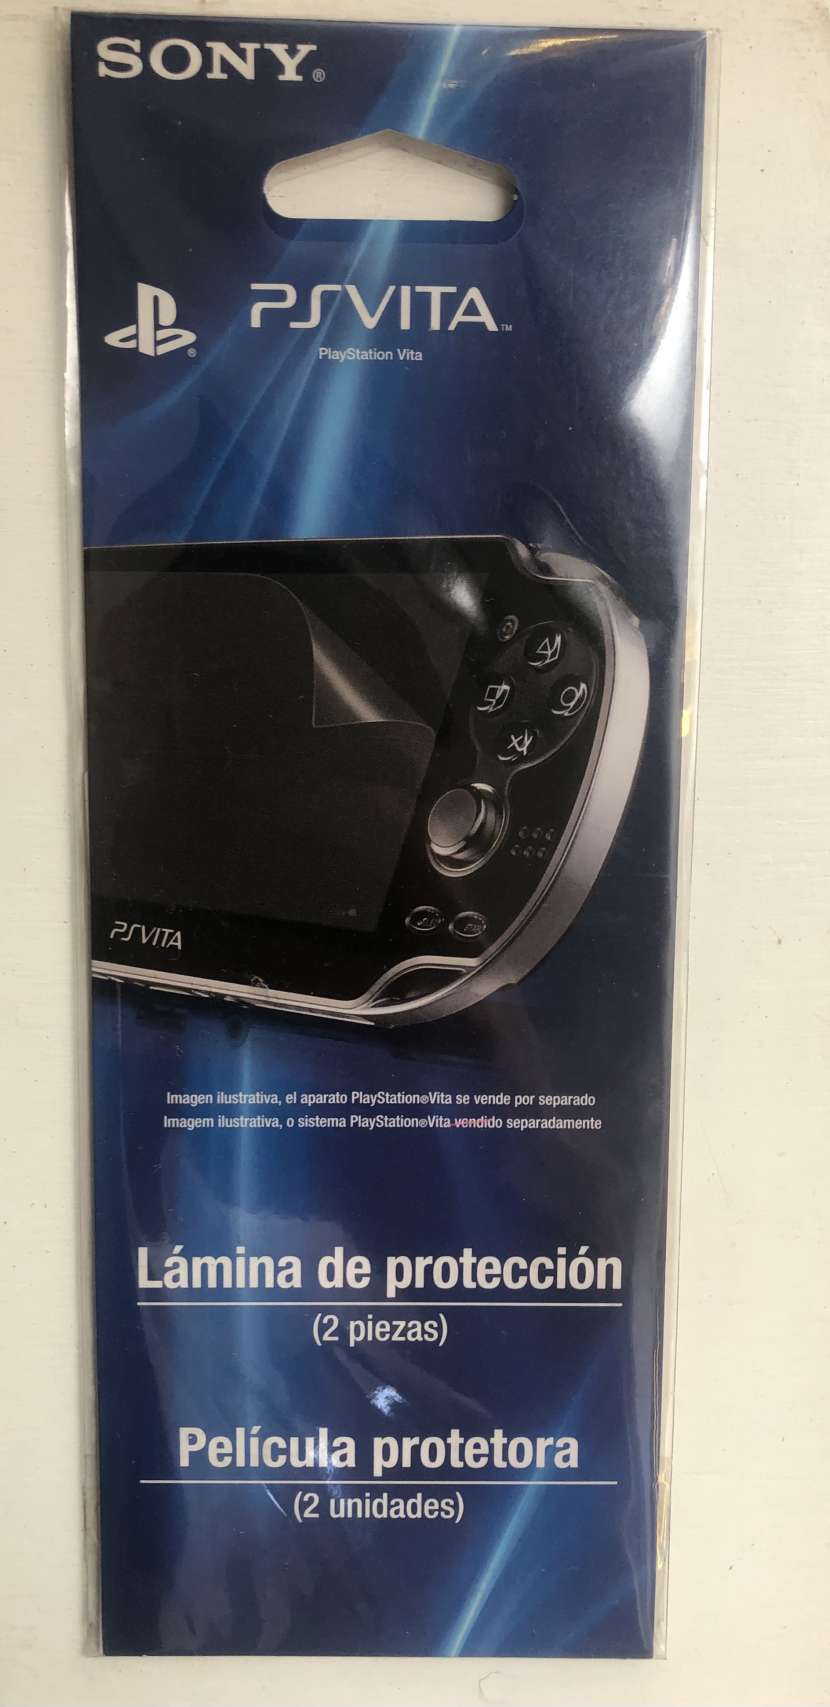 Lámina de protección PS-Vita - 0